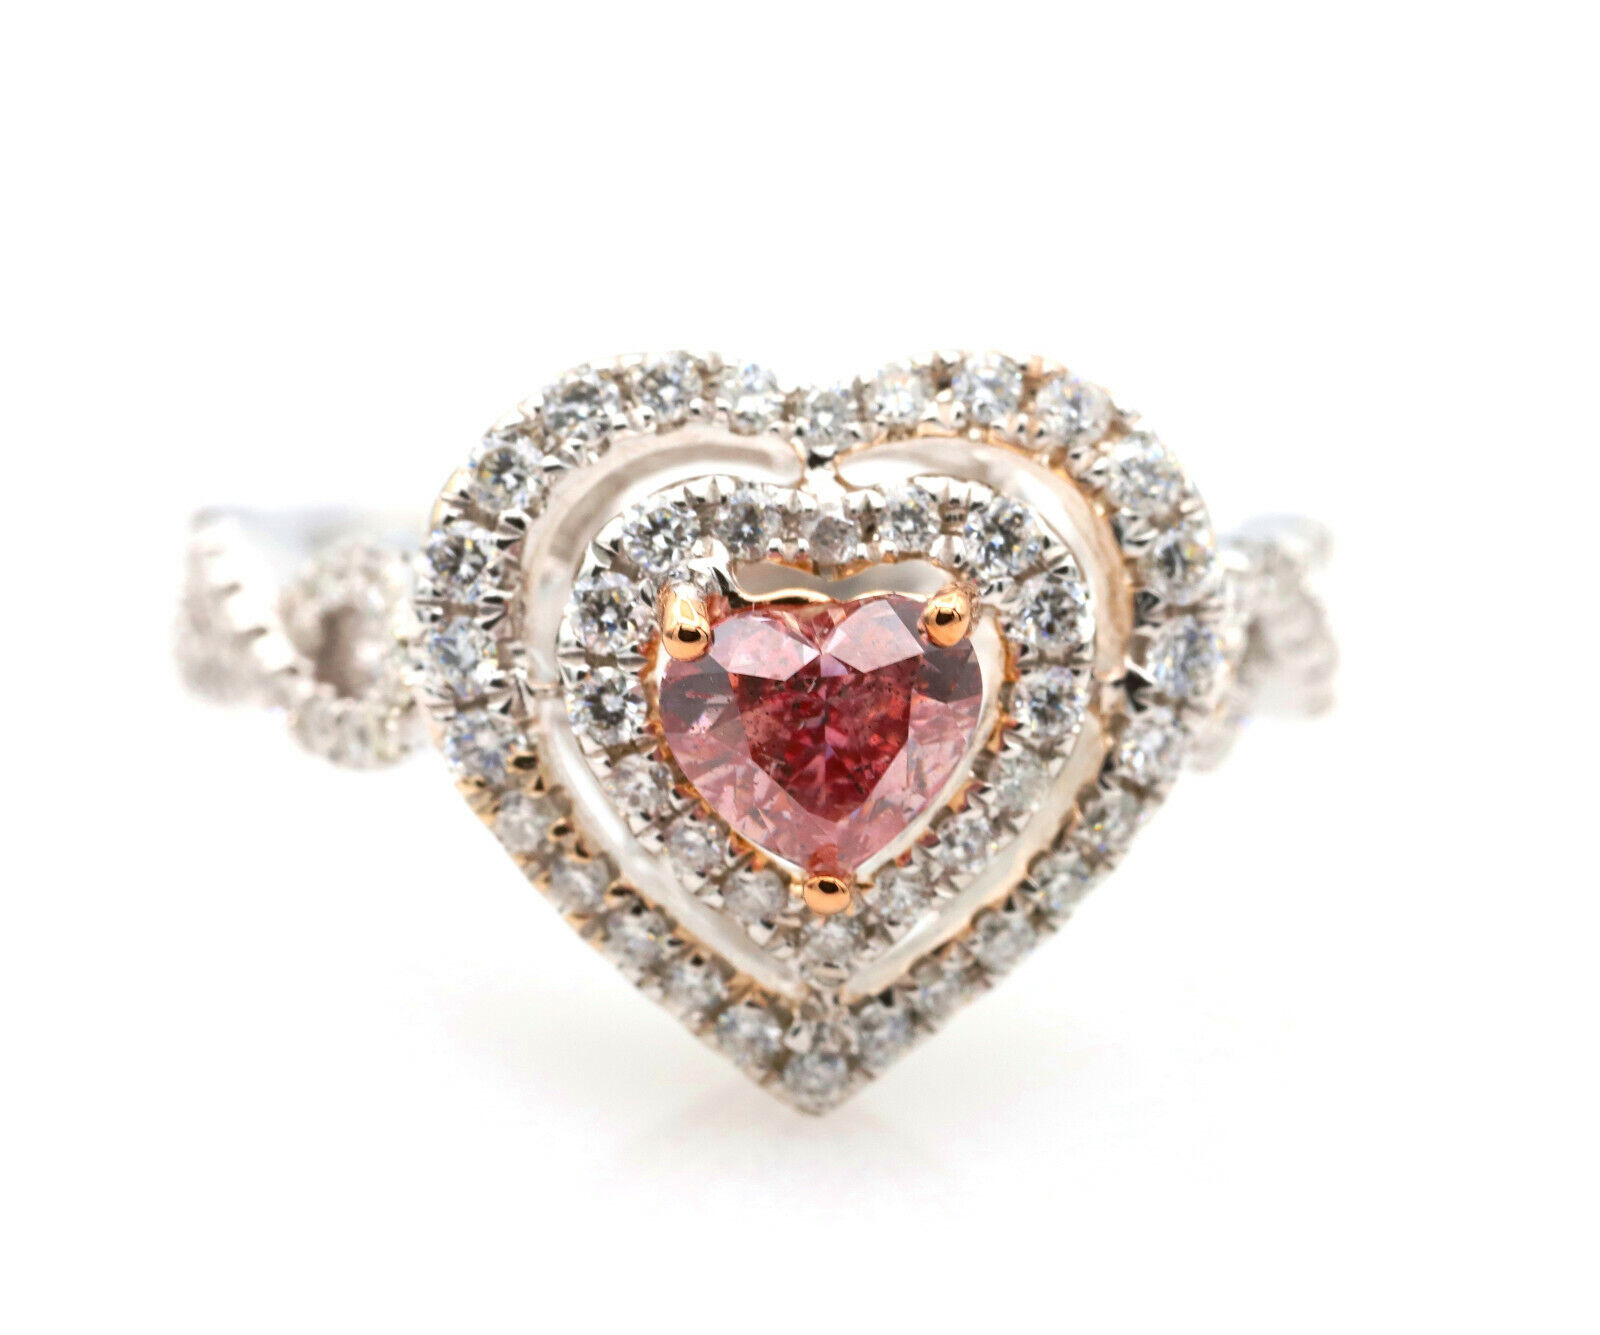 Argyle 1.07ct Natural Fancy Deep Pink Diamond Engagement Ring GIA 18K White Gold